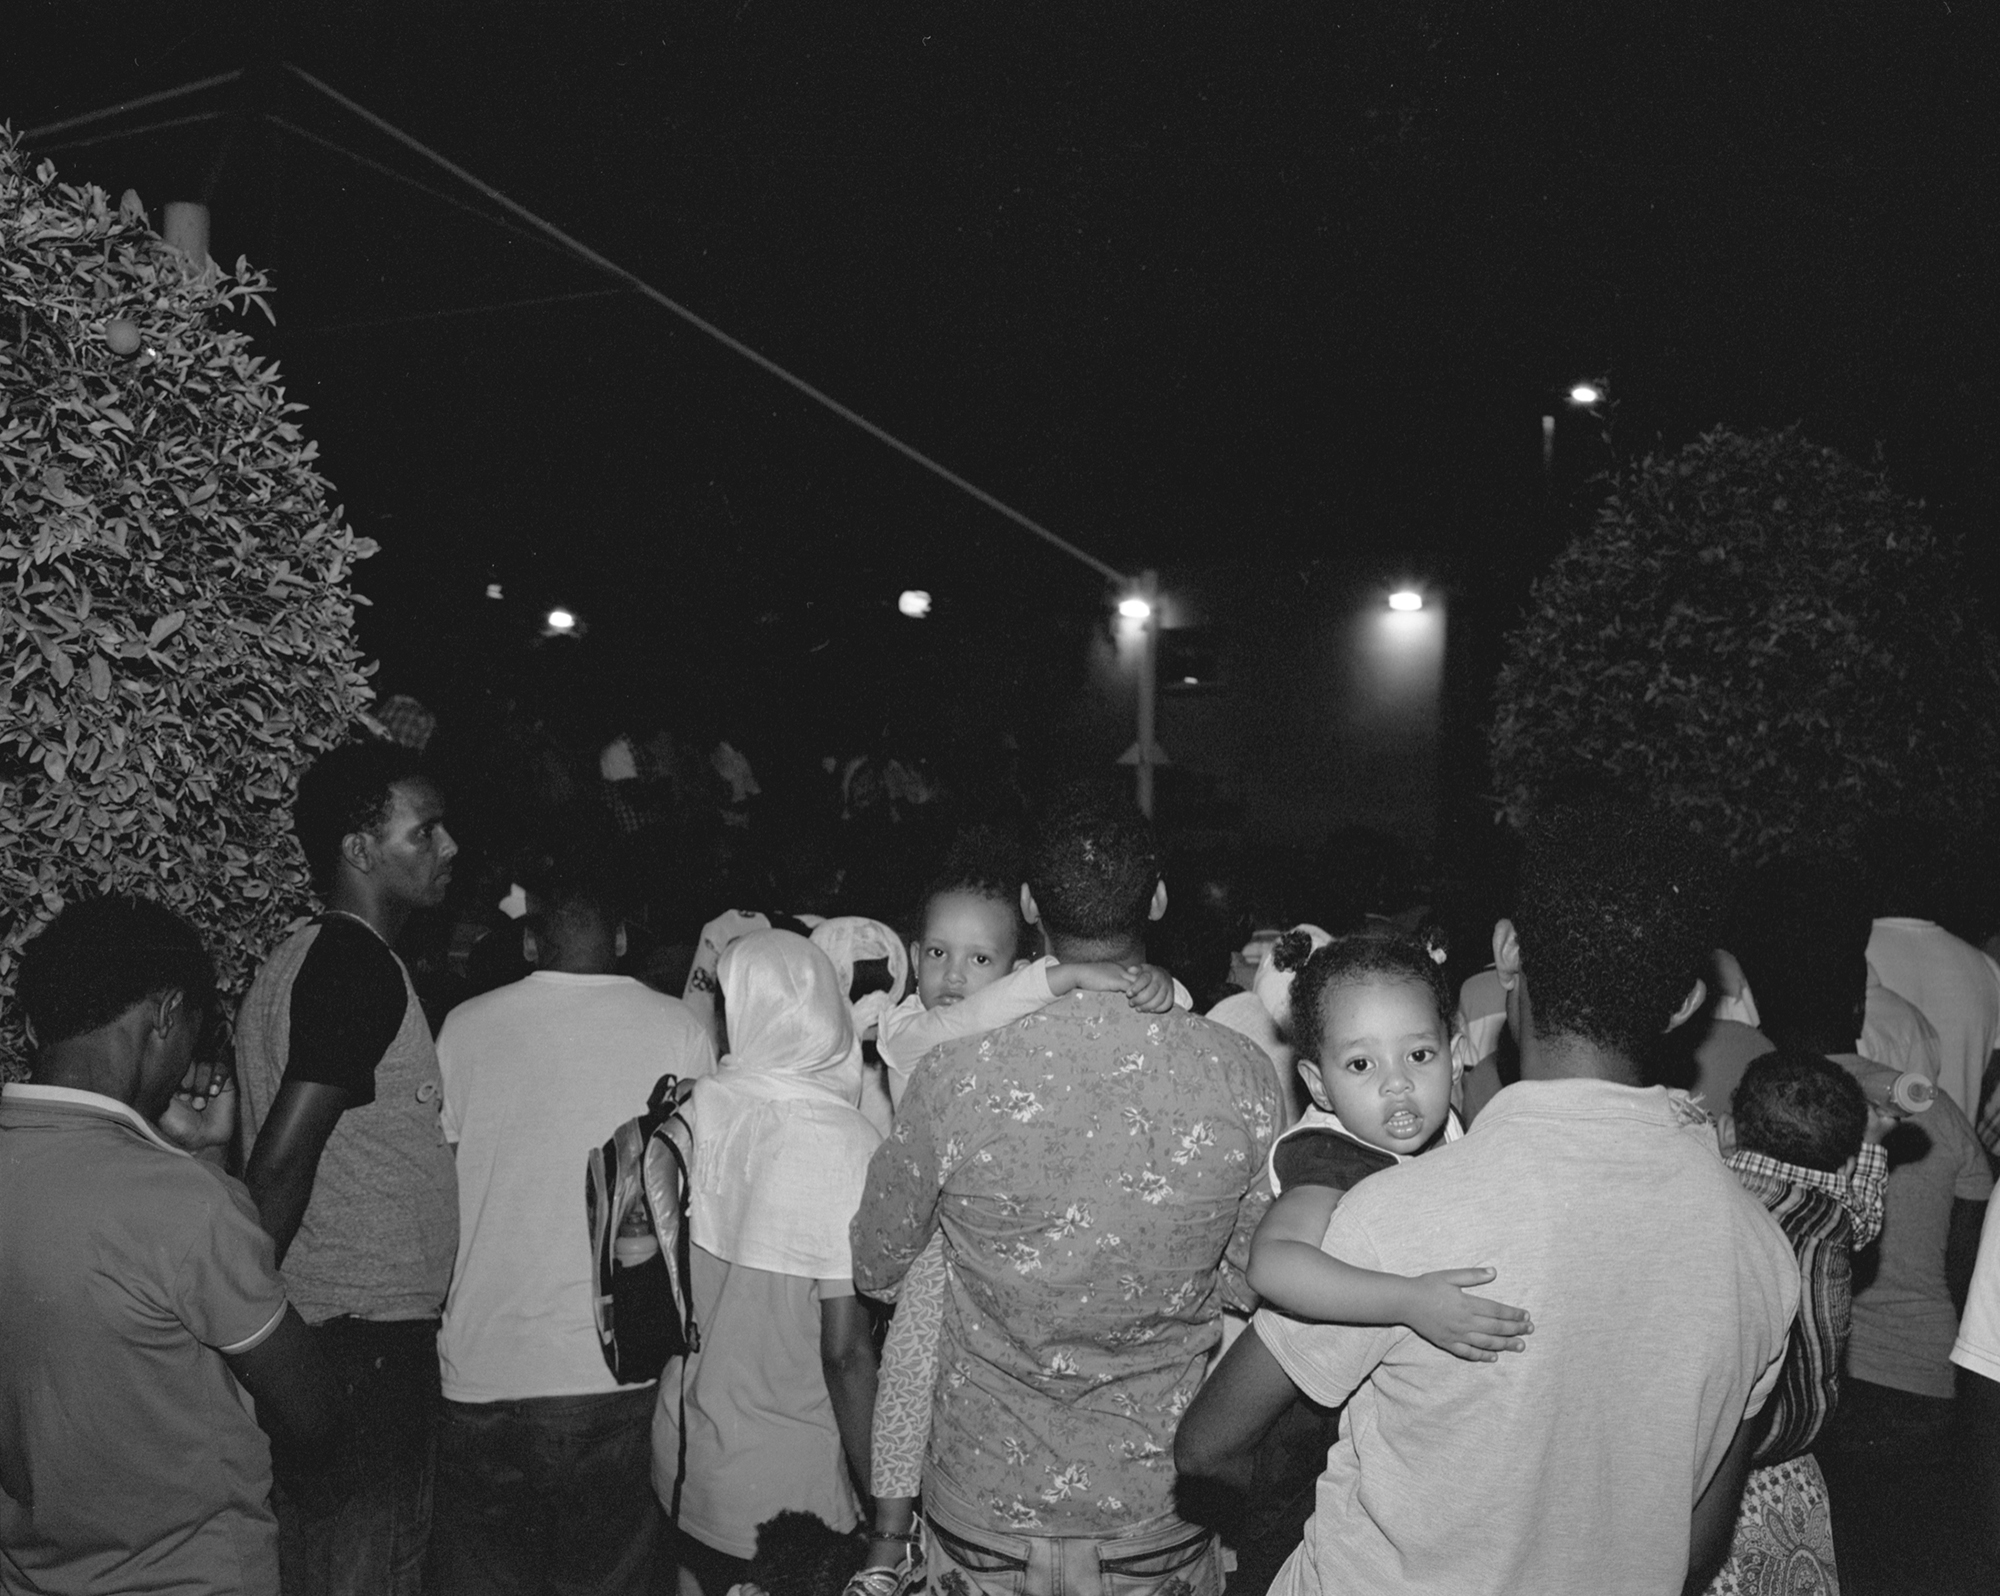 Civil Rights demonstration, Neve Sha'anan 2016